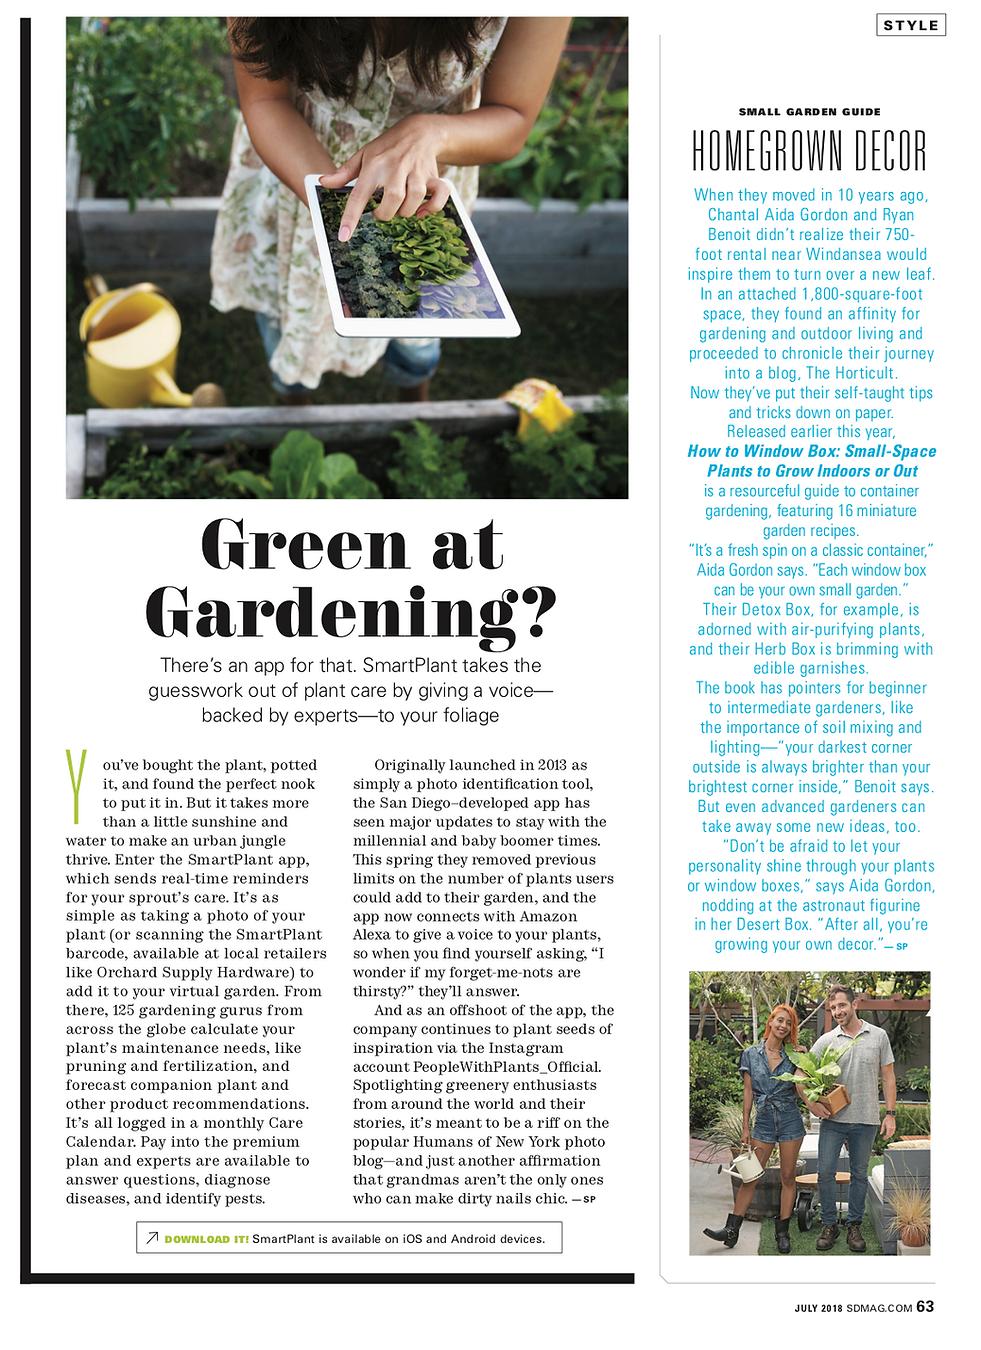 green thumb, smartplant app, smartplant, gardening applications, garden newspaper, gardening article, foilage, green plants, garden care, garden articles,